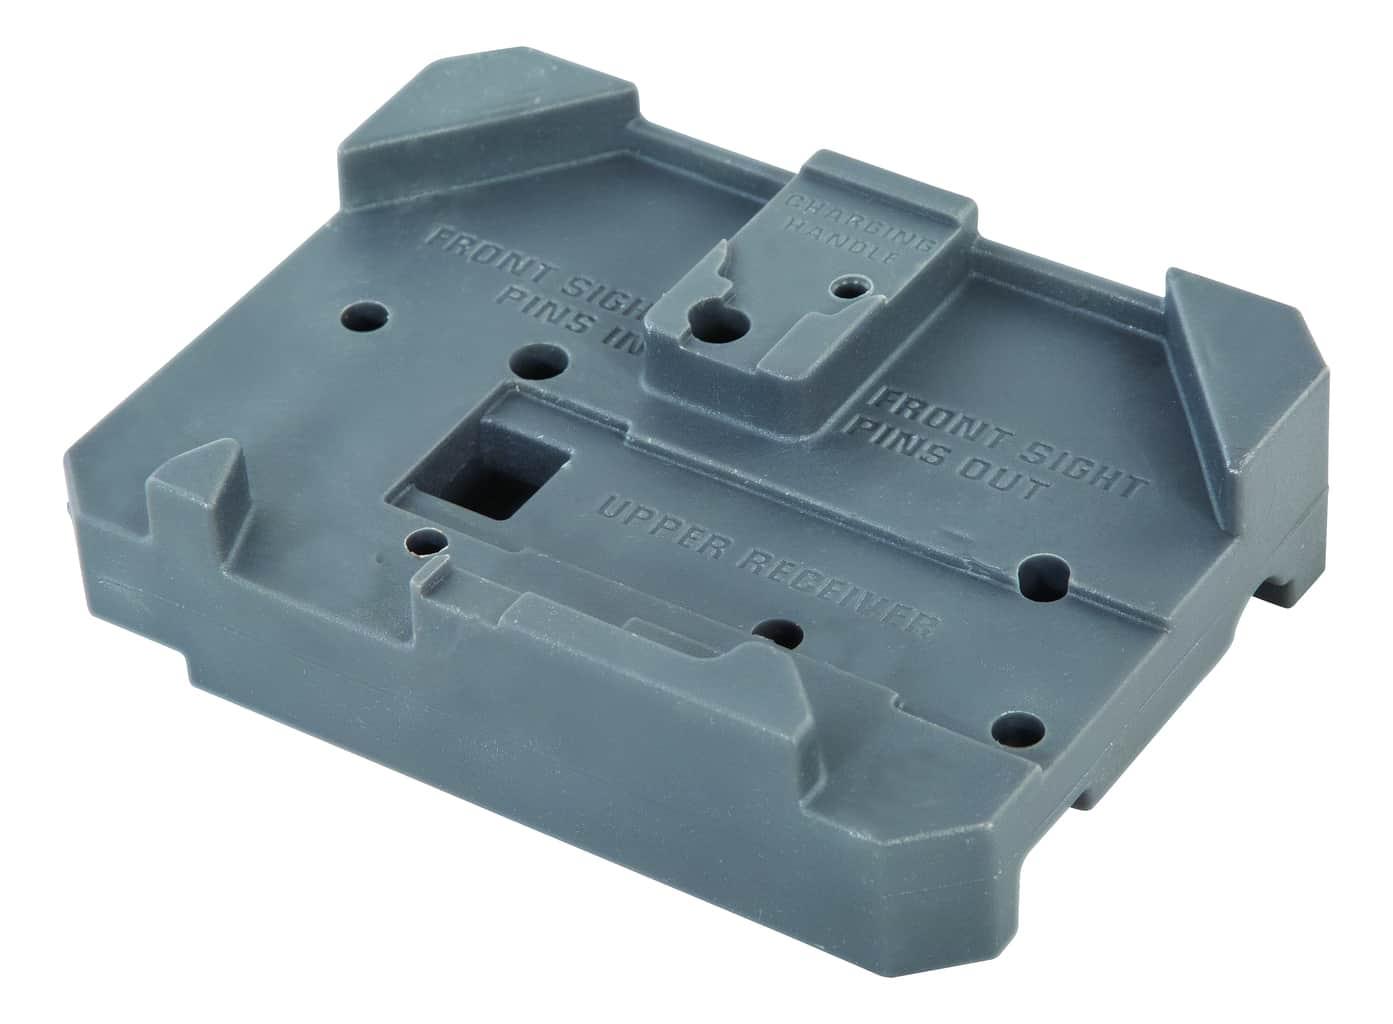 AR Armorer's Bench Block - 156945